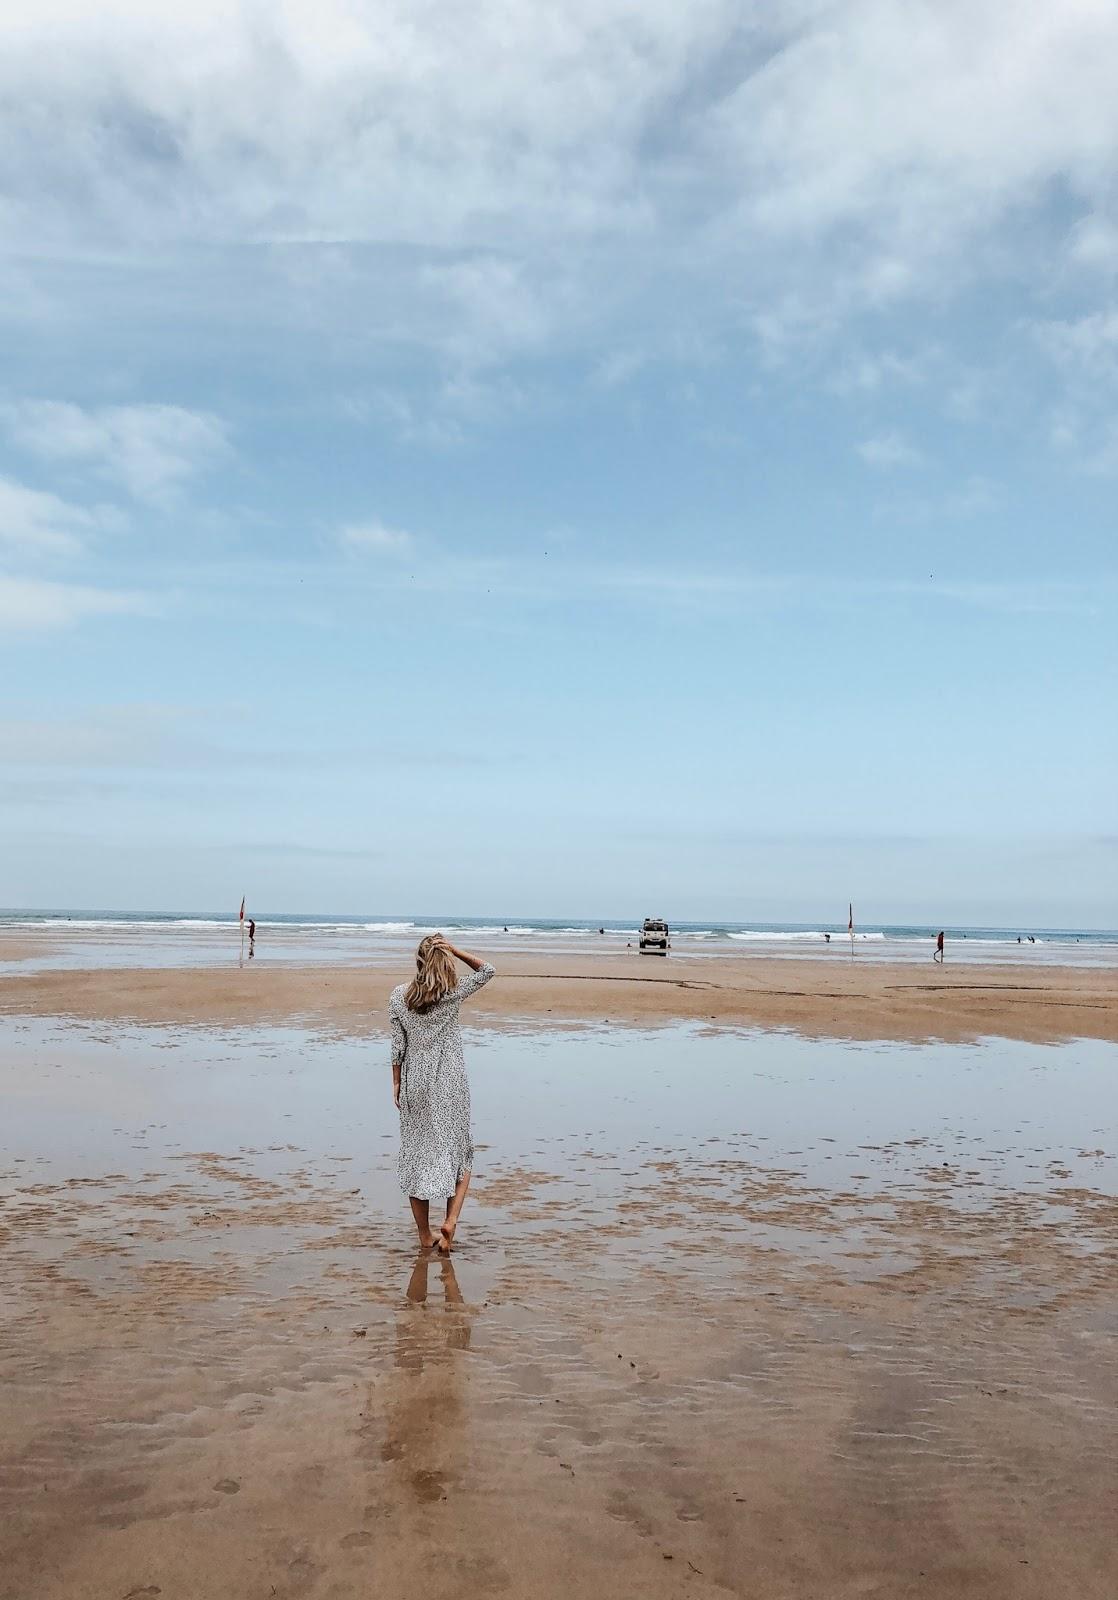 Mawgan Porth Beach, Cornwall Holidays, bedruthan Hotel & Spa, luxury stay cornwall, family holidays cornwall